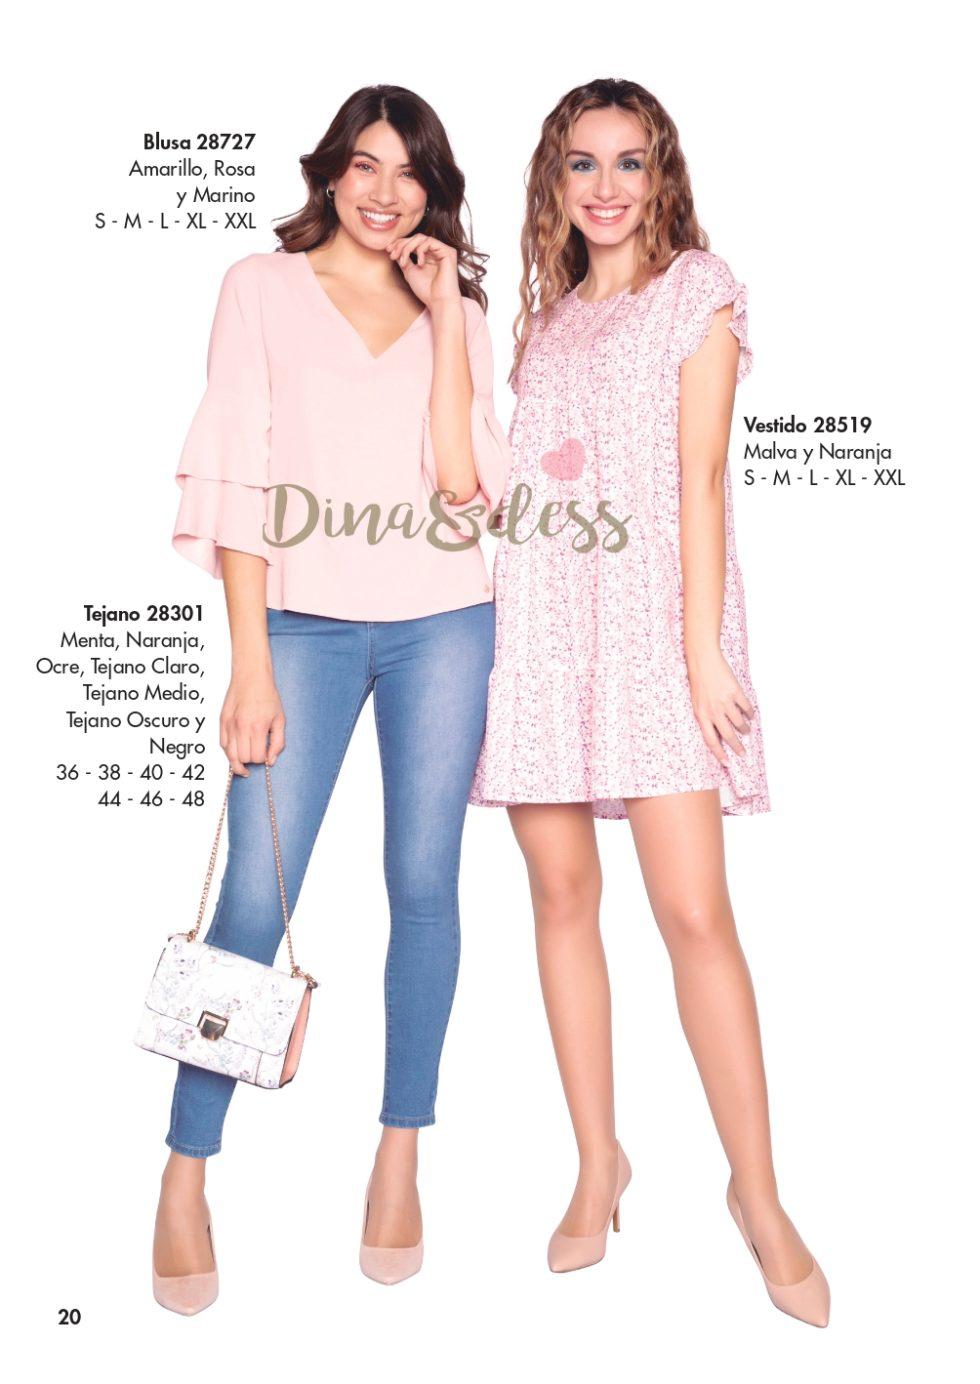 Verano 2021 Dina&Dess Clientes_page-0022